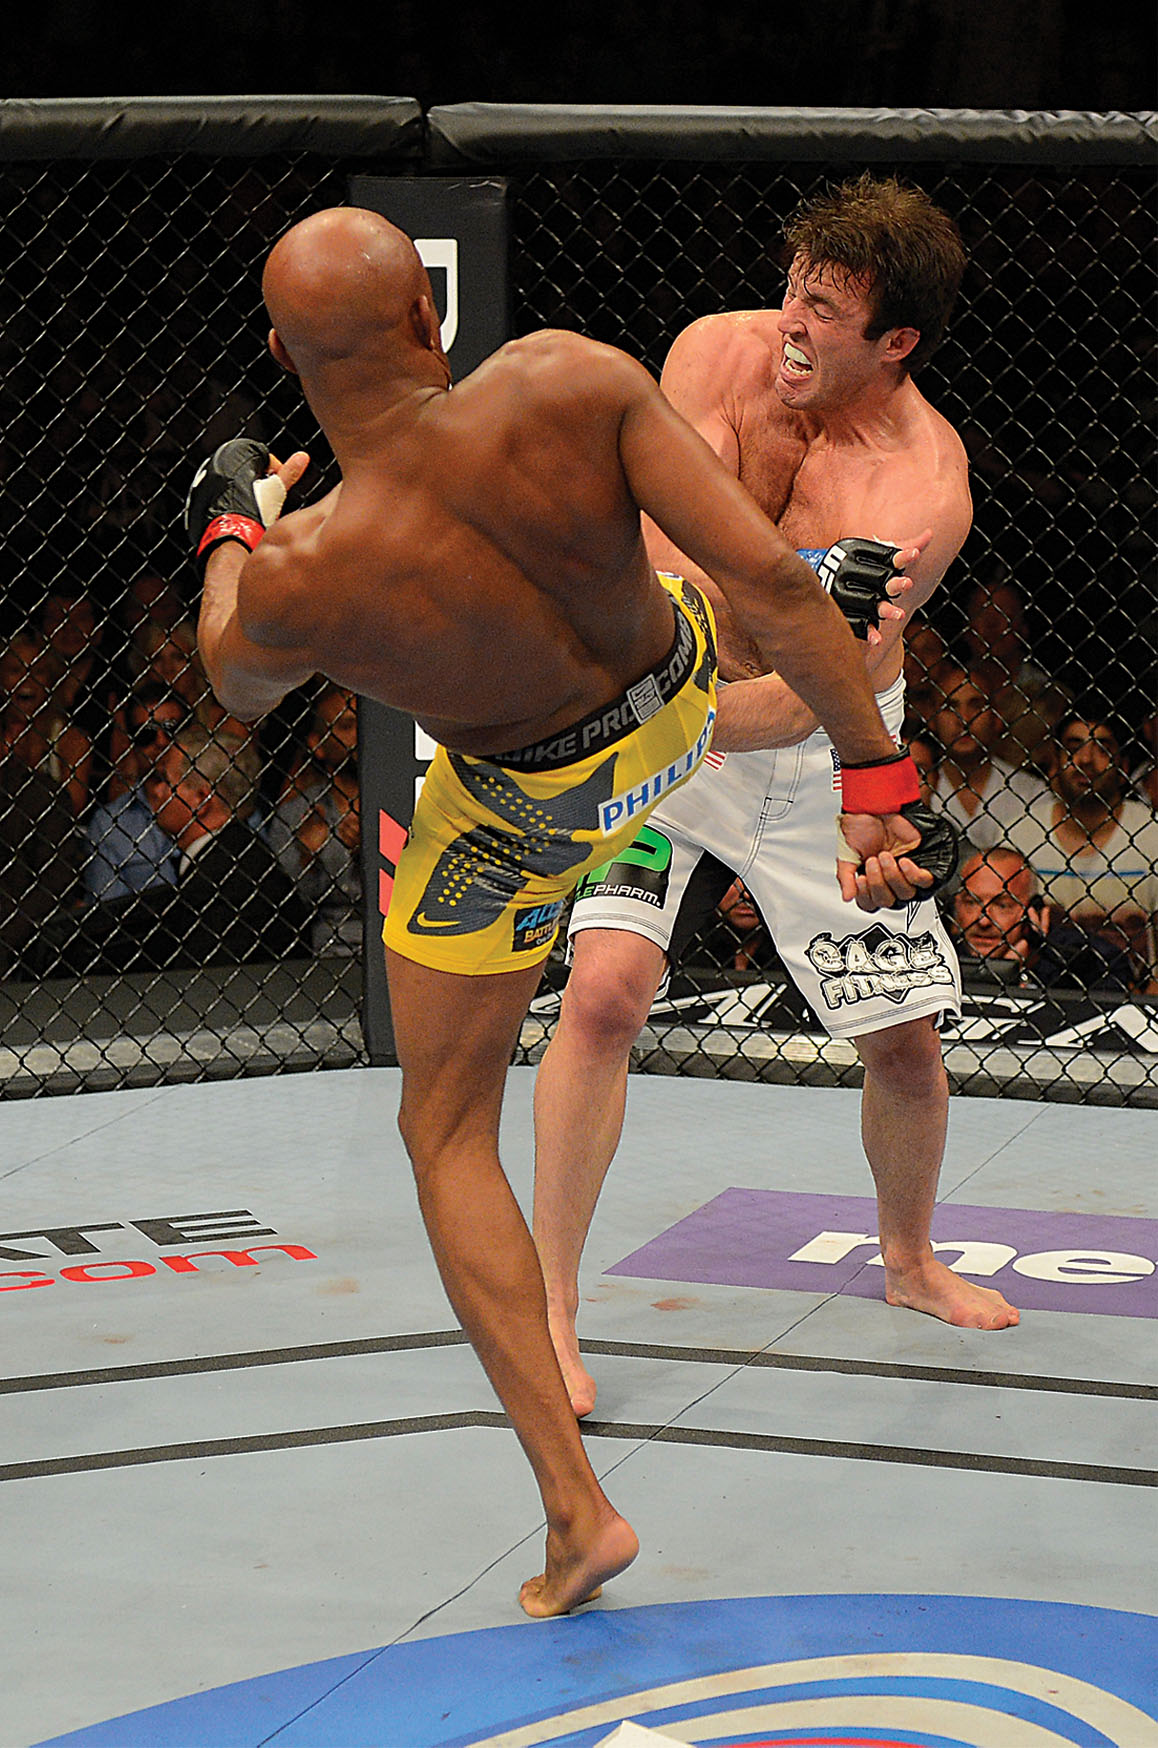 video review : Anderson Silva versus Chael Sonnen at UFC 148